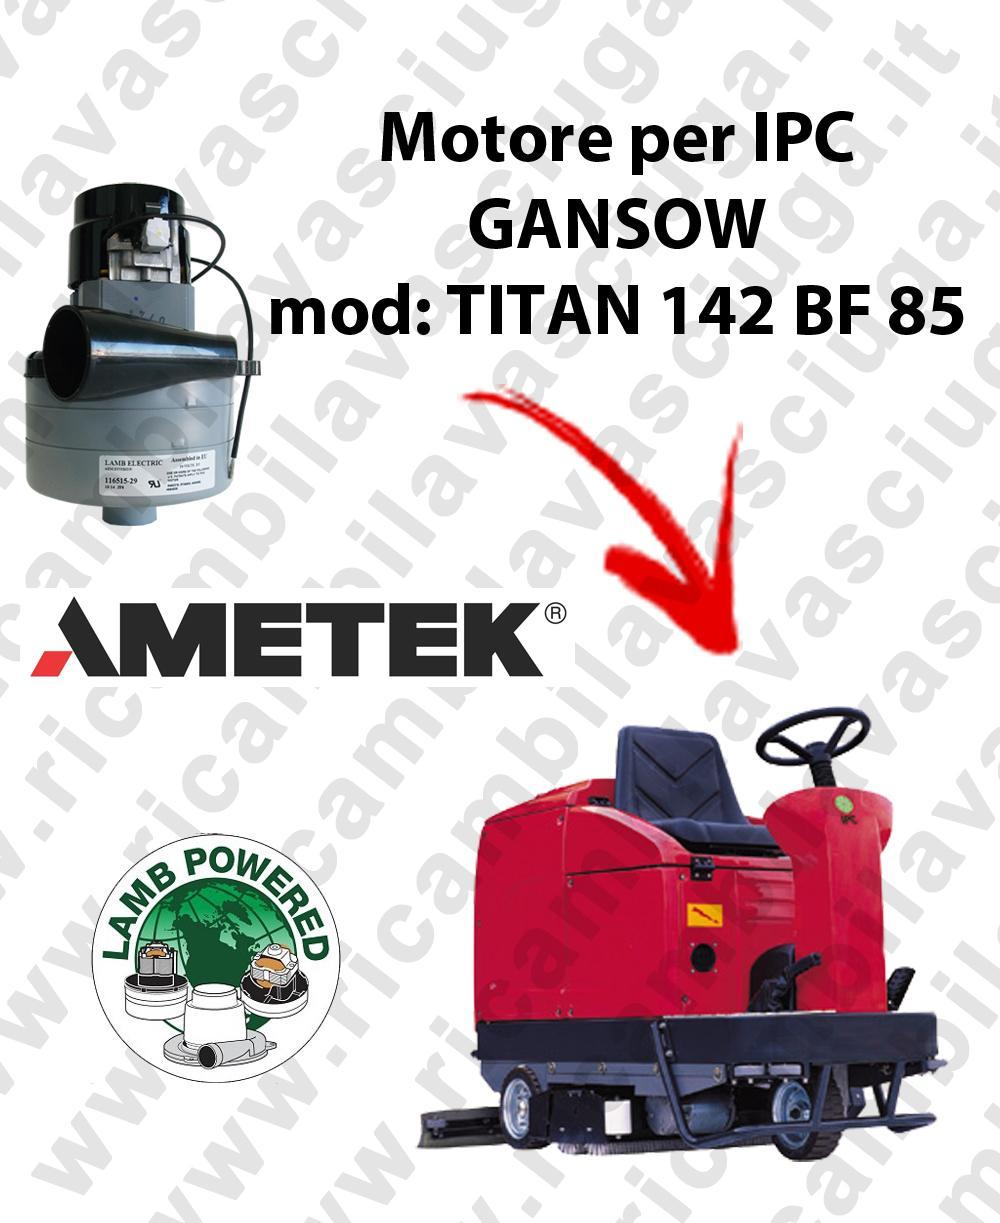 TITAN 142 BF 85 Saugmotor LAMB AMETEK für scheuersaugmaschinen IPC GANSOW